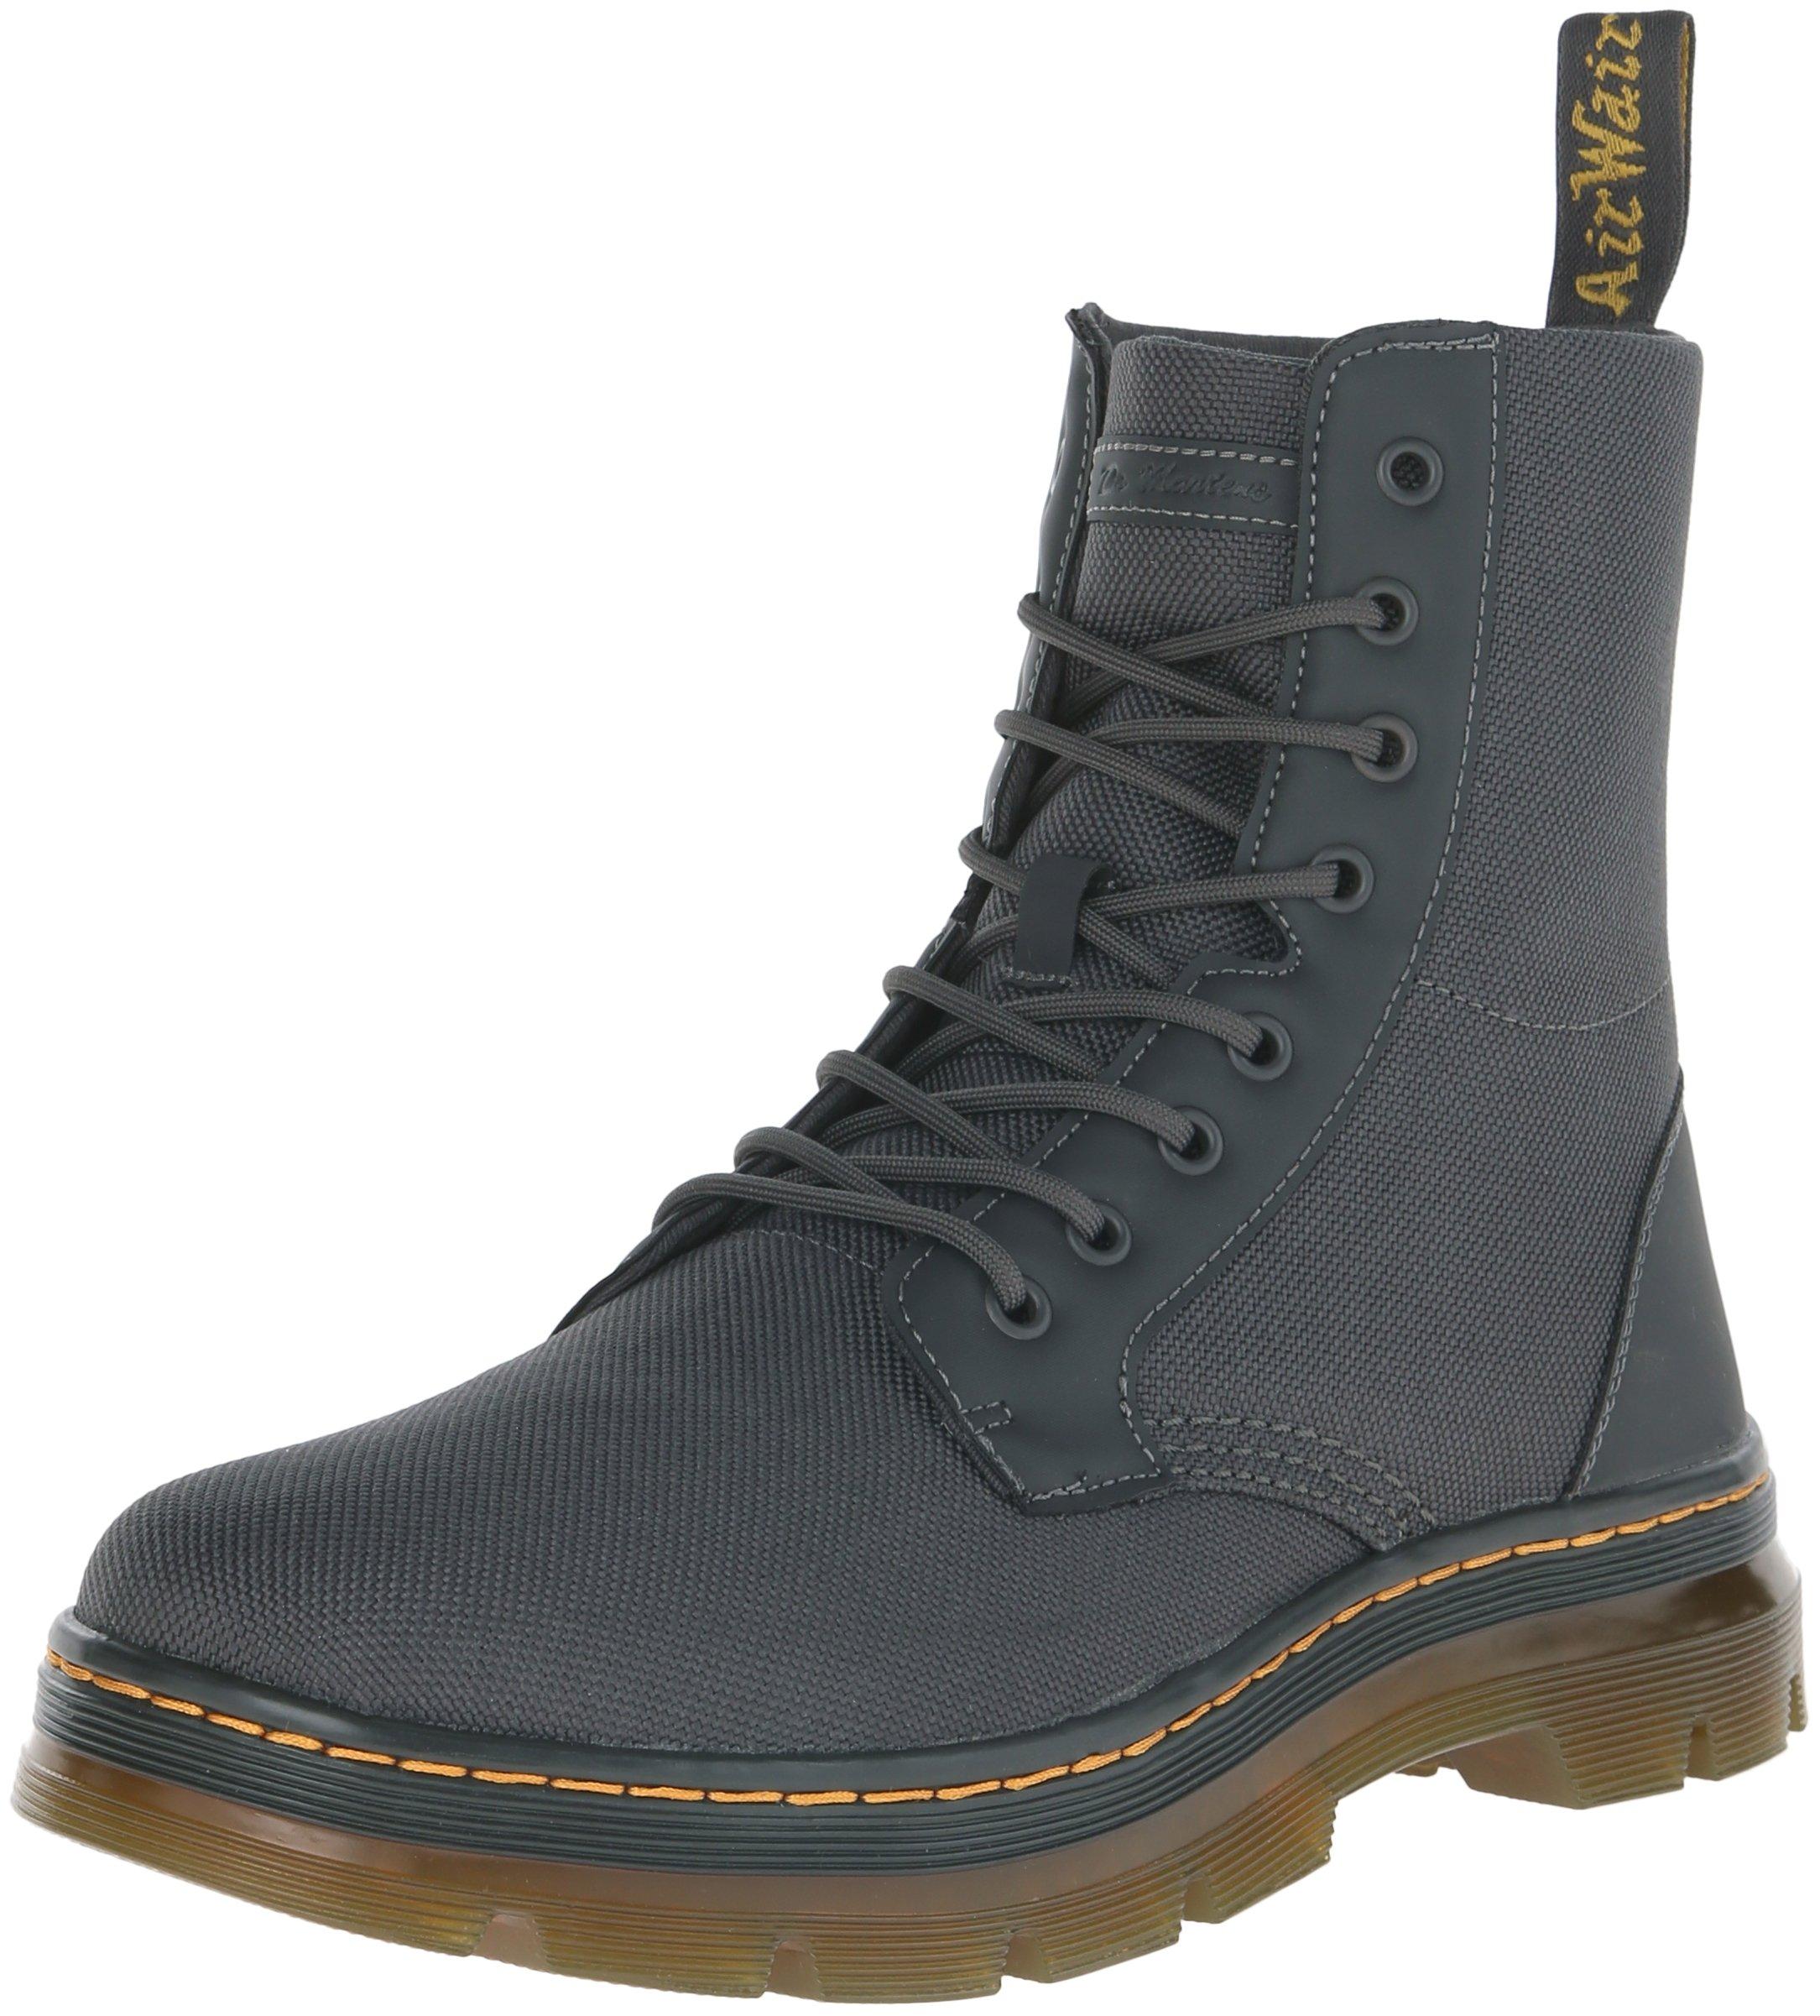 Dr. Martens Men's Combs Nylon Combat Boot, Charcoal, 12 UK/13 M US